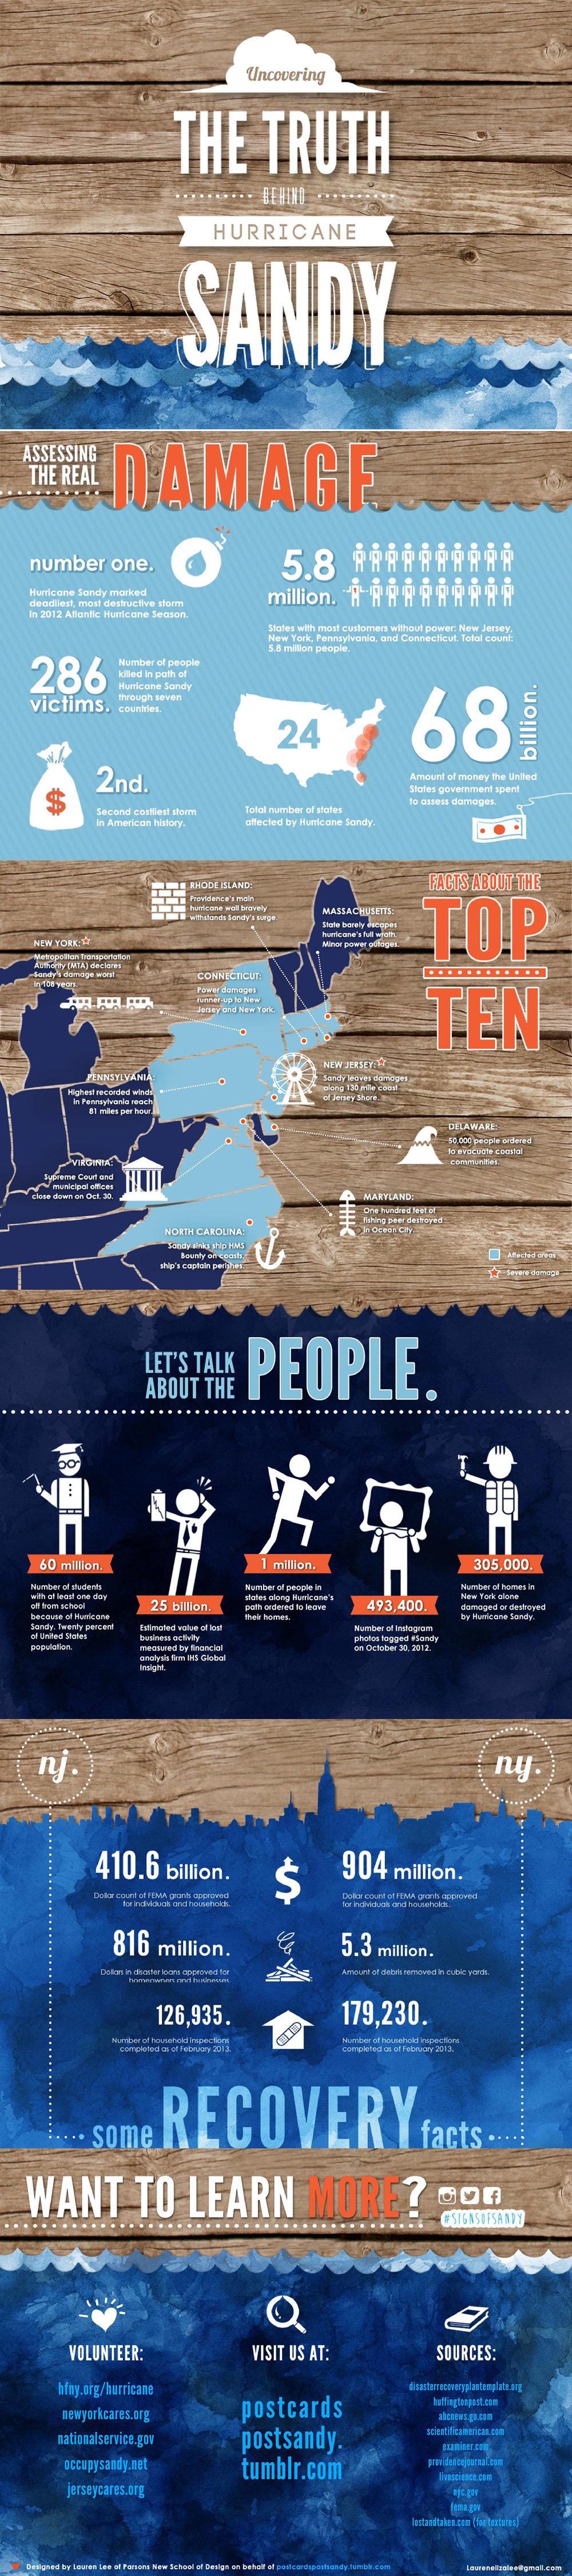 Postcards Post Sandy Infographic_longversion_small.jpg